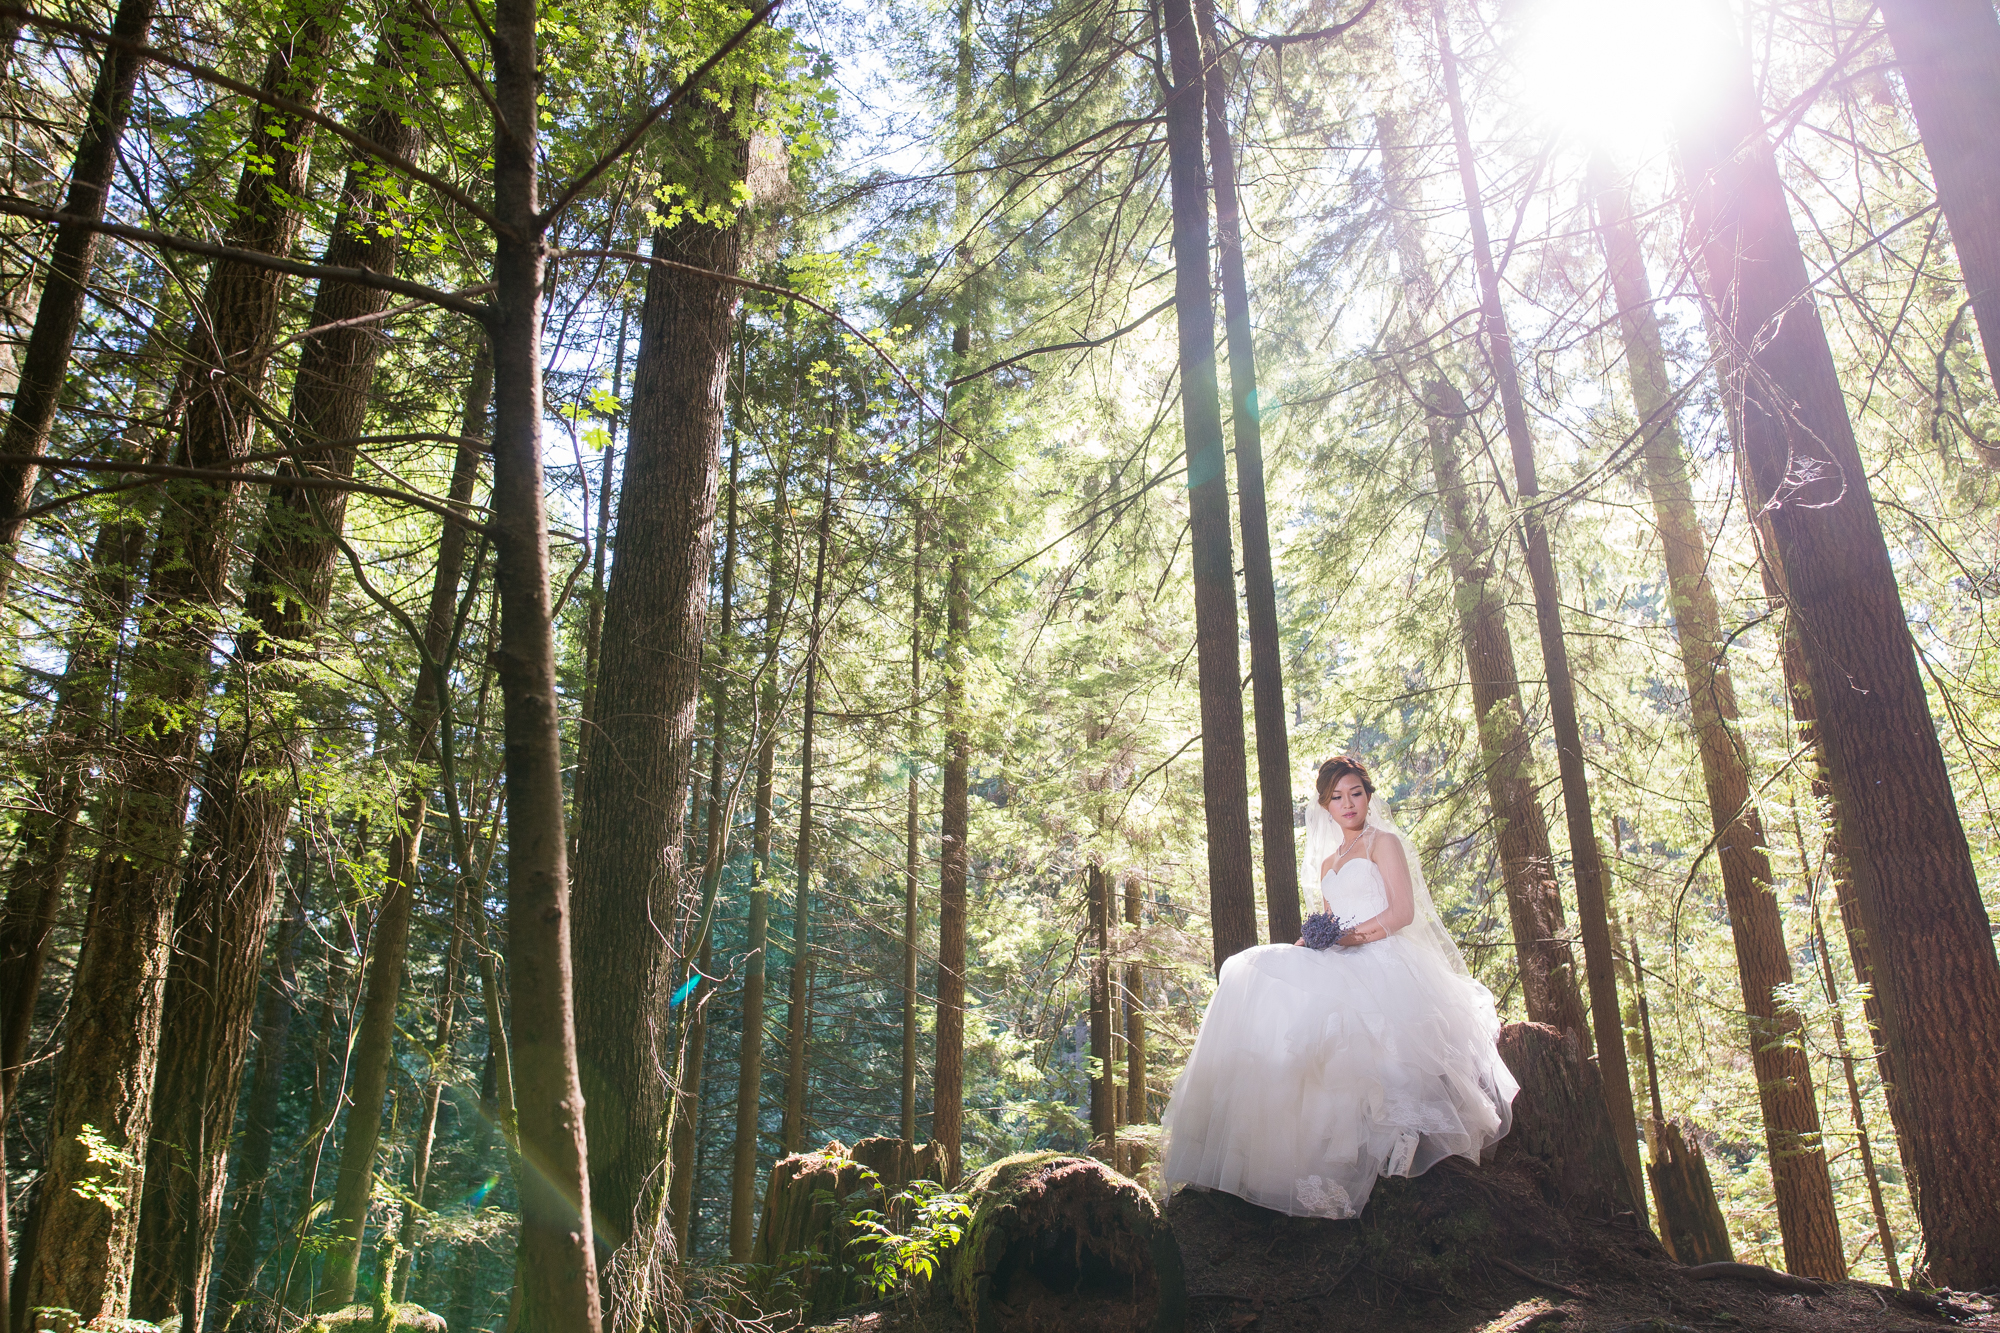 2017may6-FionaAnthonyPrewedding-Highlight-8